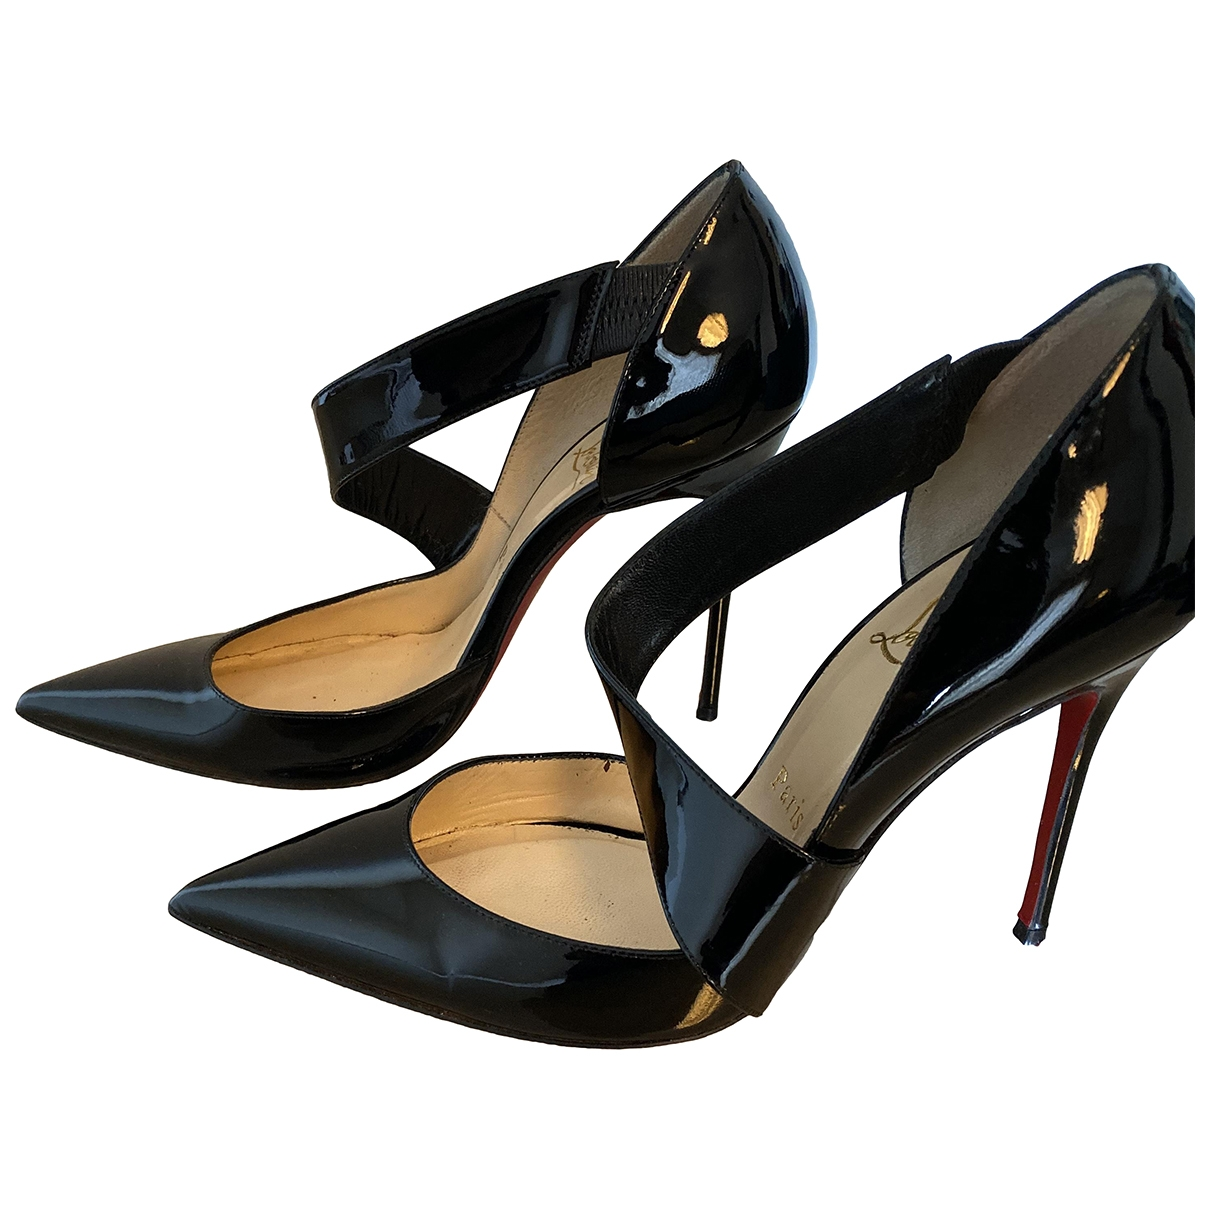 Christian Louboutin \N Black Patent leather Heels for Women 38.5 EU